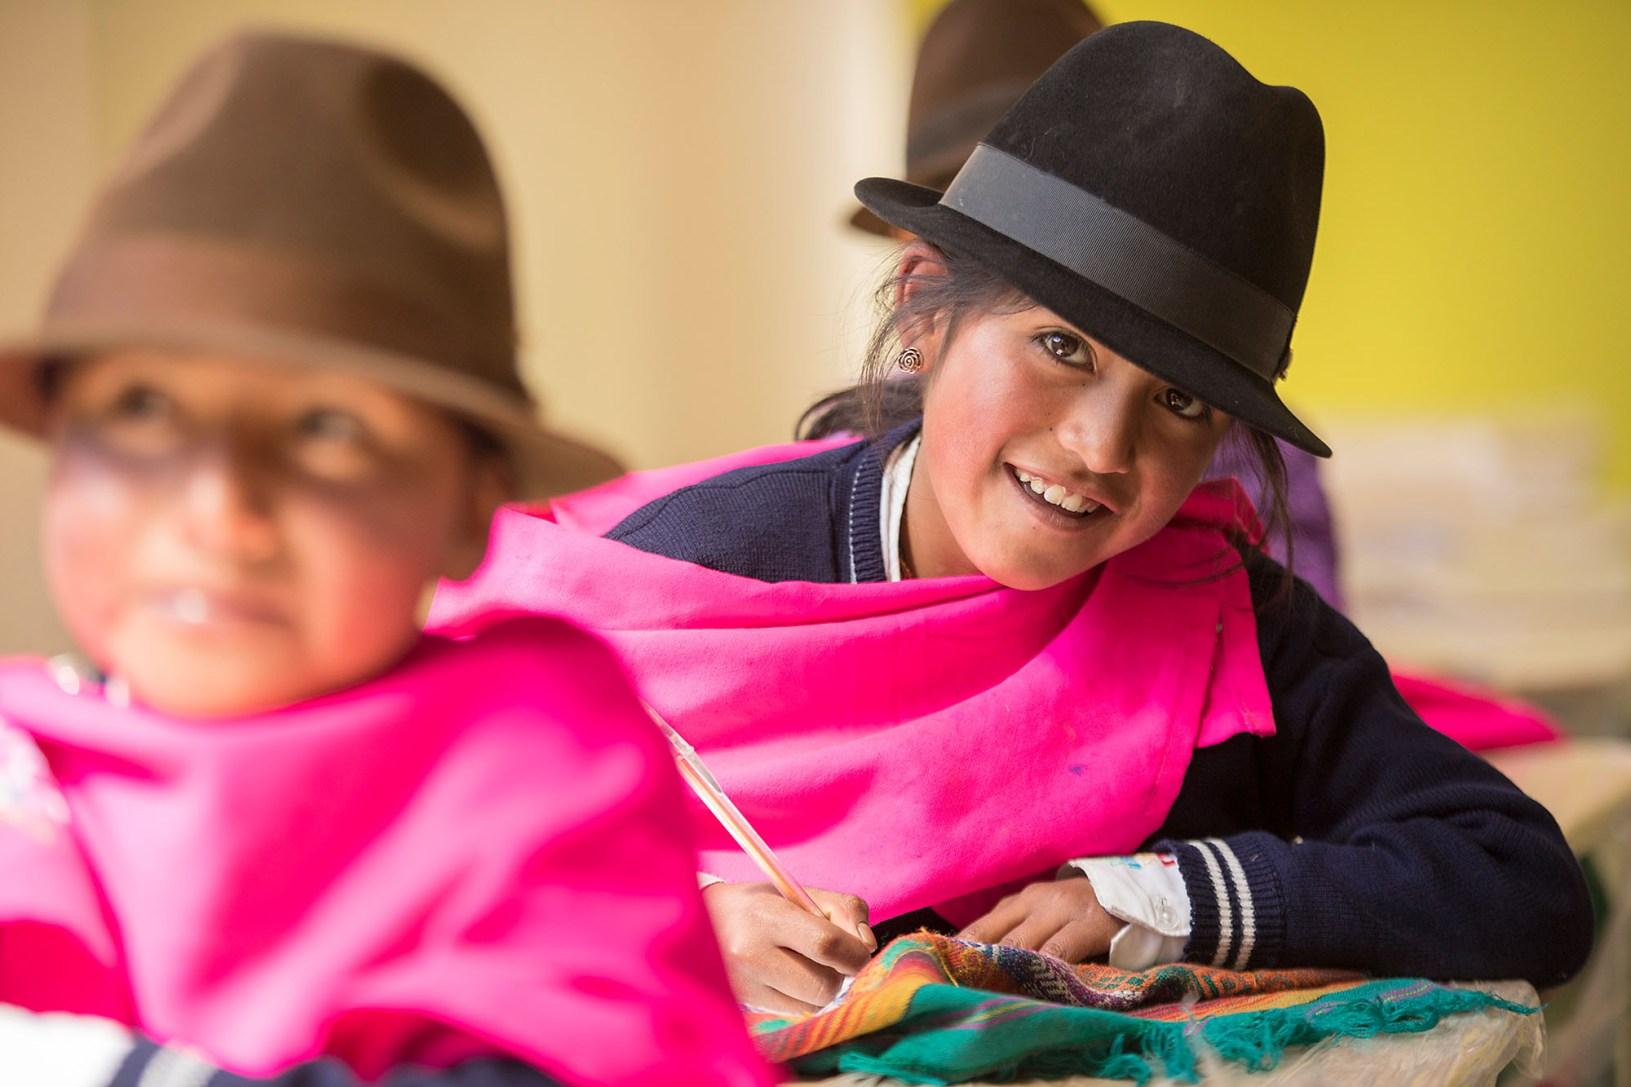 Marisol (9) attends elementary school in Cotopaxi Province, Ecuador.